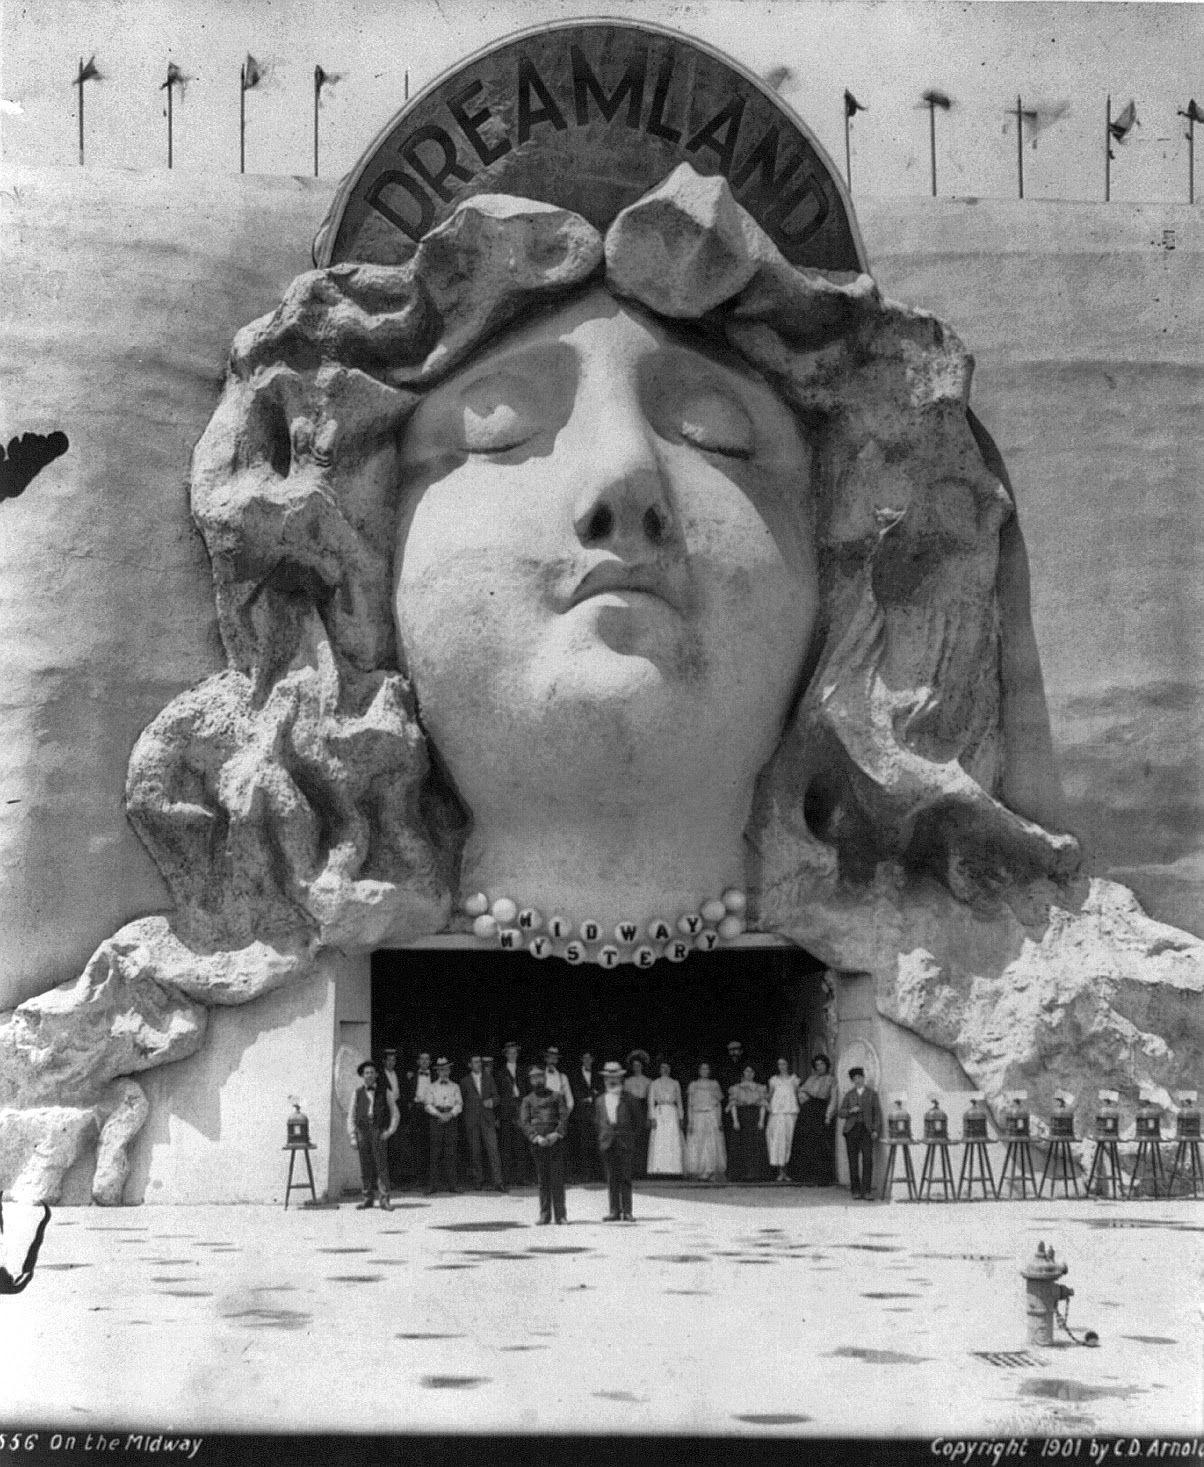 Dreamland Midland Mystery, Coney Island, 1901